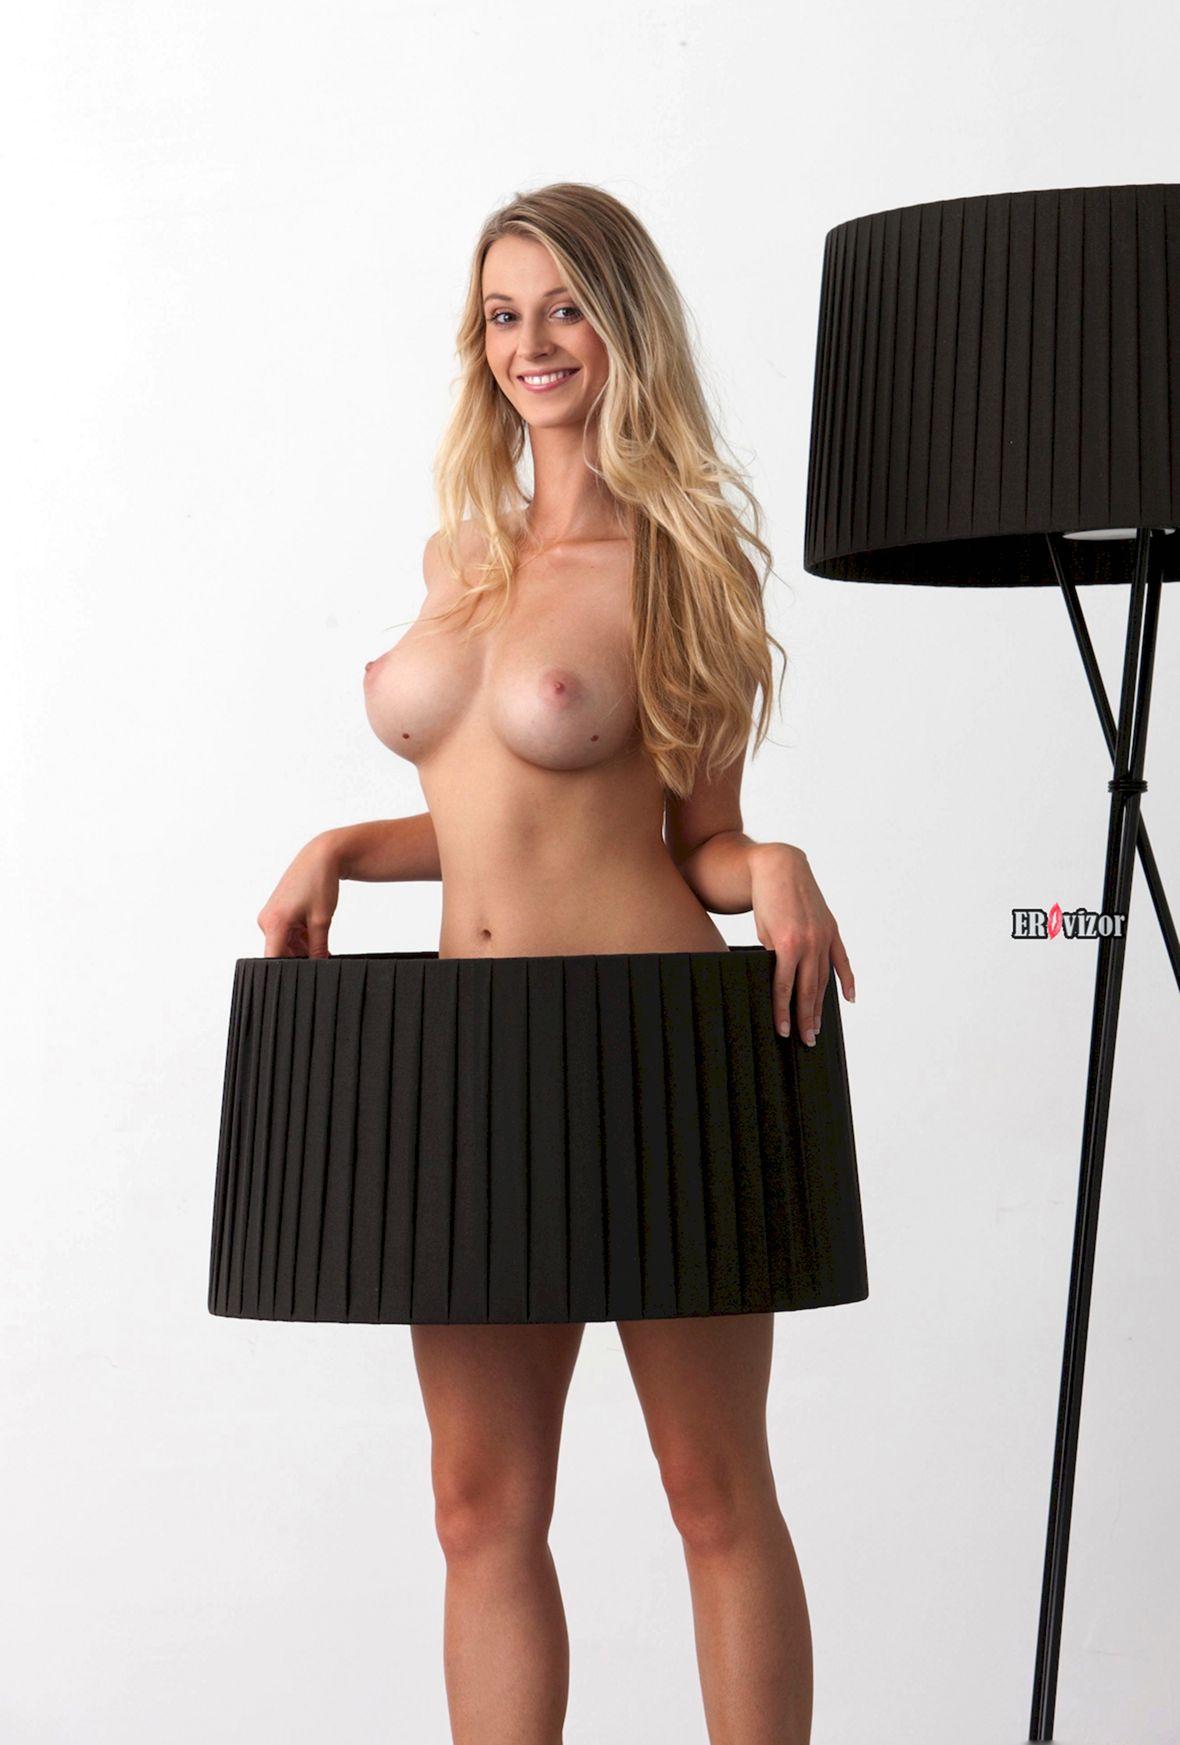 Blonde-Babe-Carisha-with-Big-Tits (16)